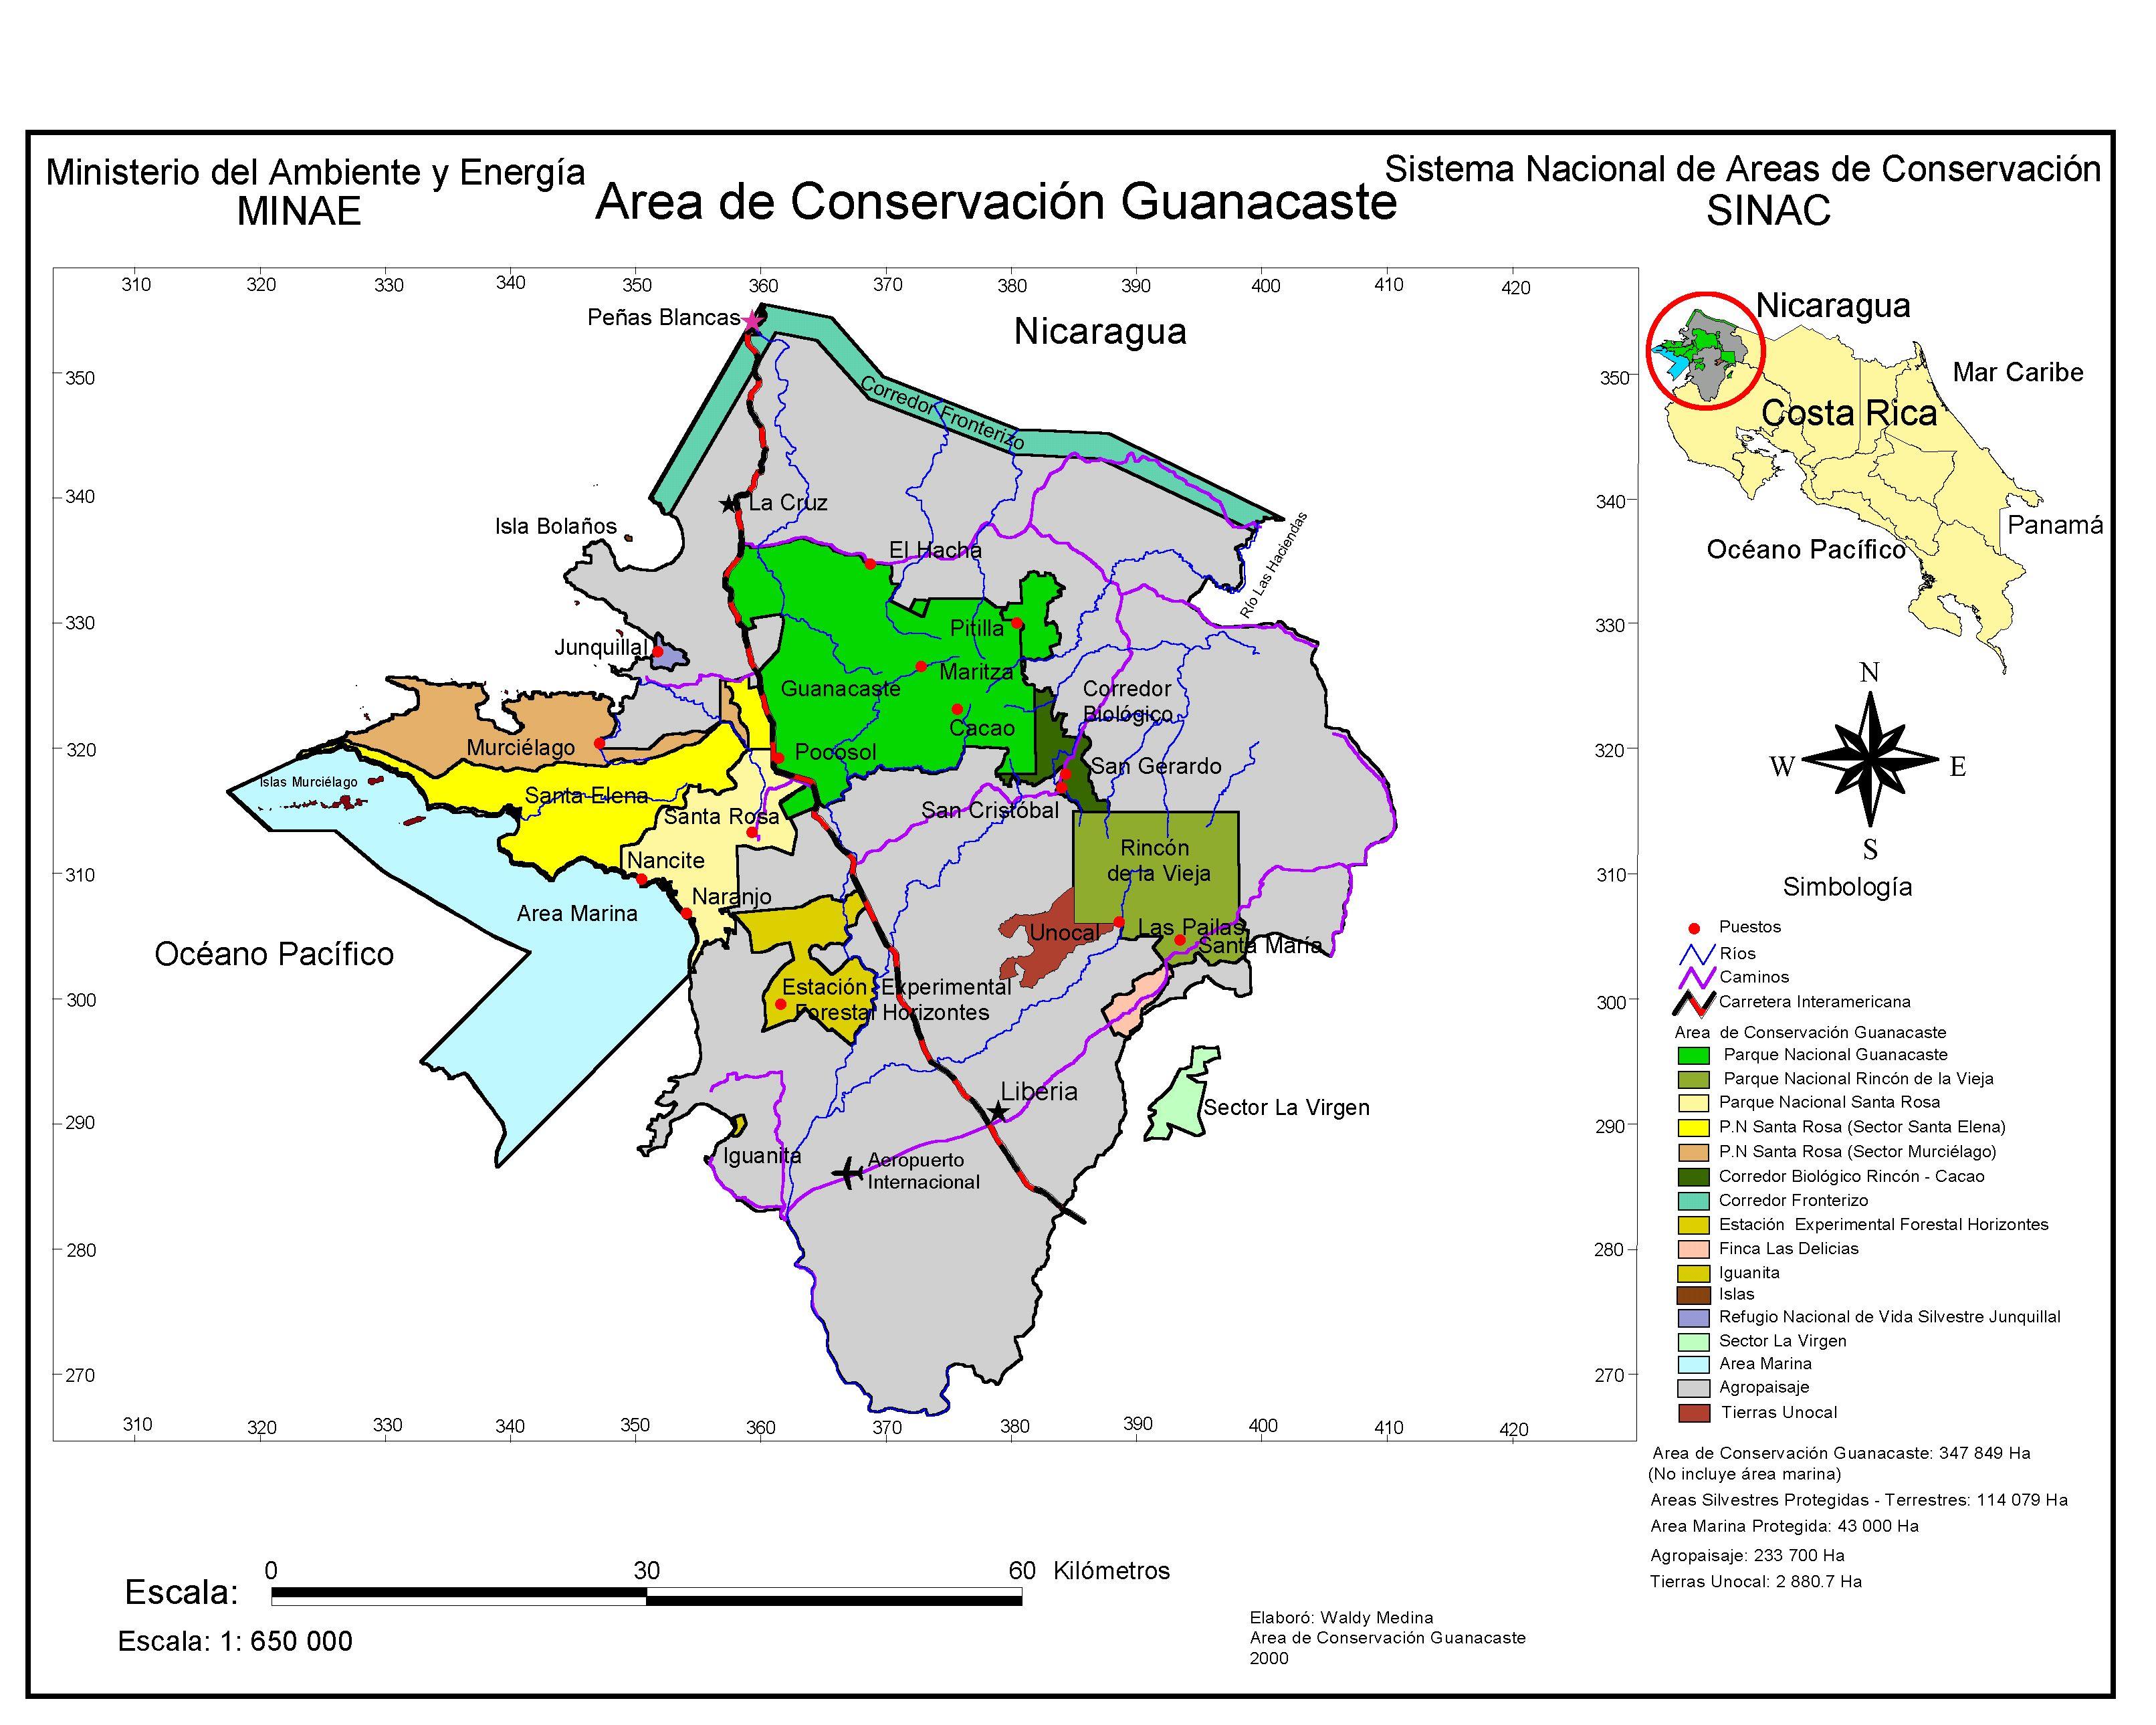 Worksheet. Sistemas de Informacin Geogrfica  rea de Conservacin Guanacaste